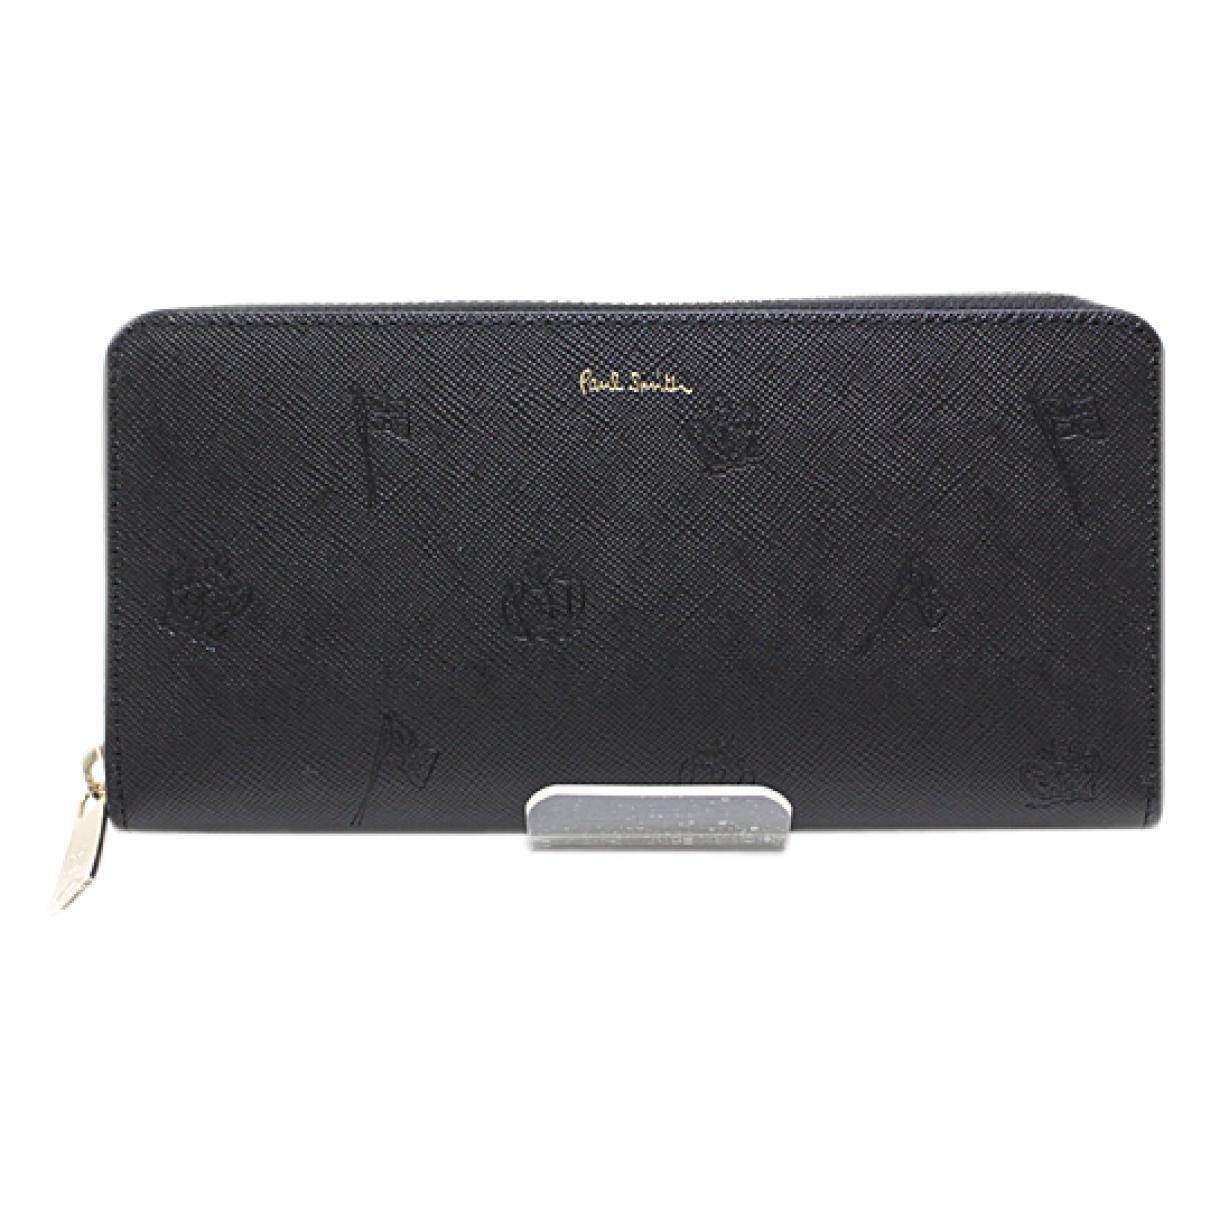 Paul Smith \N Black Leather wallet for Women \N